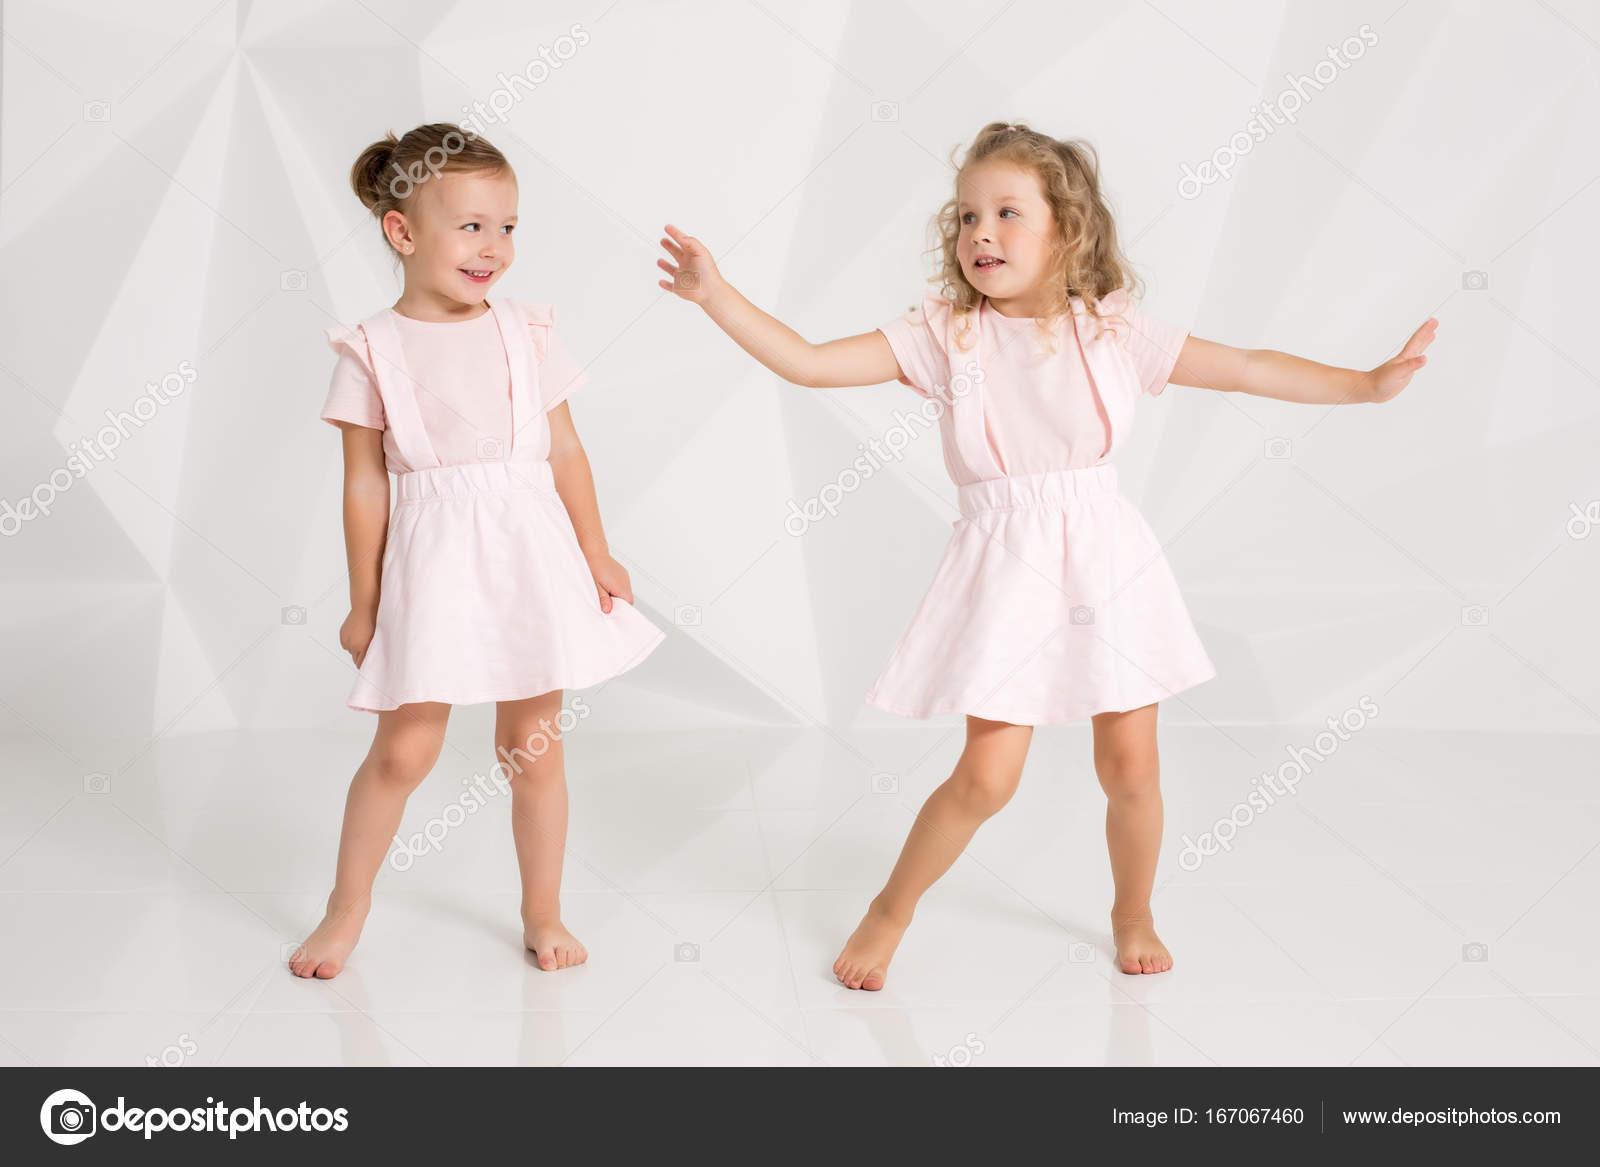 6c6832fad95b Δύο λίγο αστεία και γελώντας κορίτσι σε απαλά ροζ φορέματα, θέτοντας σε  λευκό studio. Όμορφη μικρή μόδα μοντέλα σε φόντο λευκό στούντιο — Εικόνα  από ...